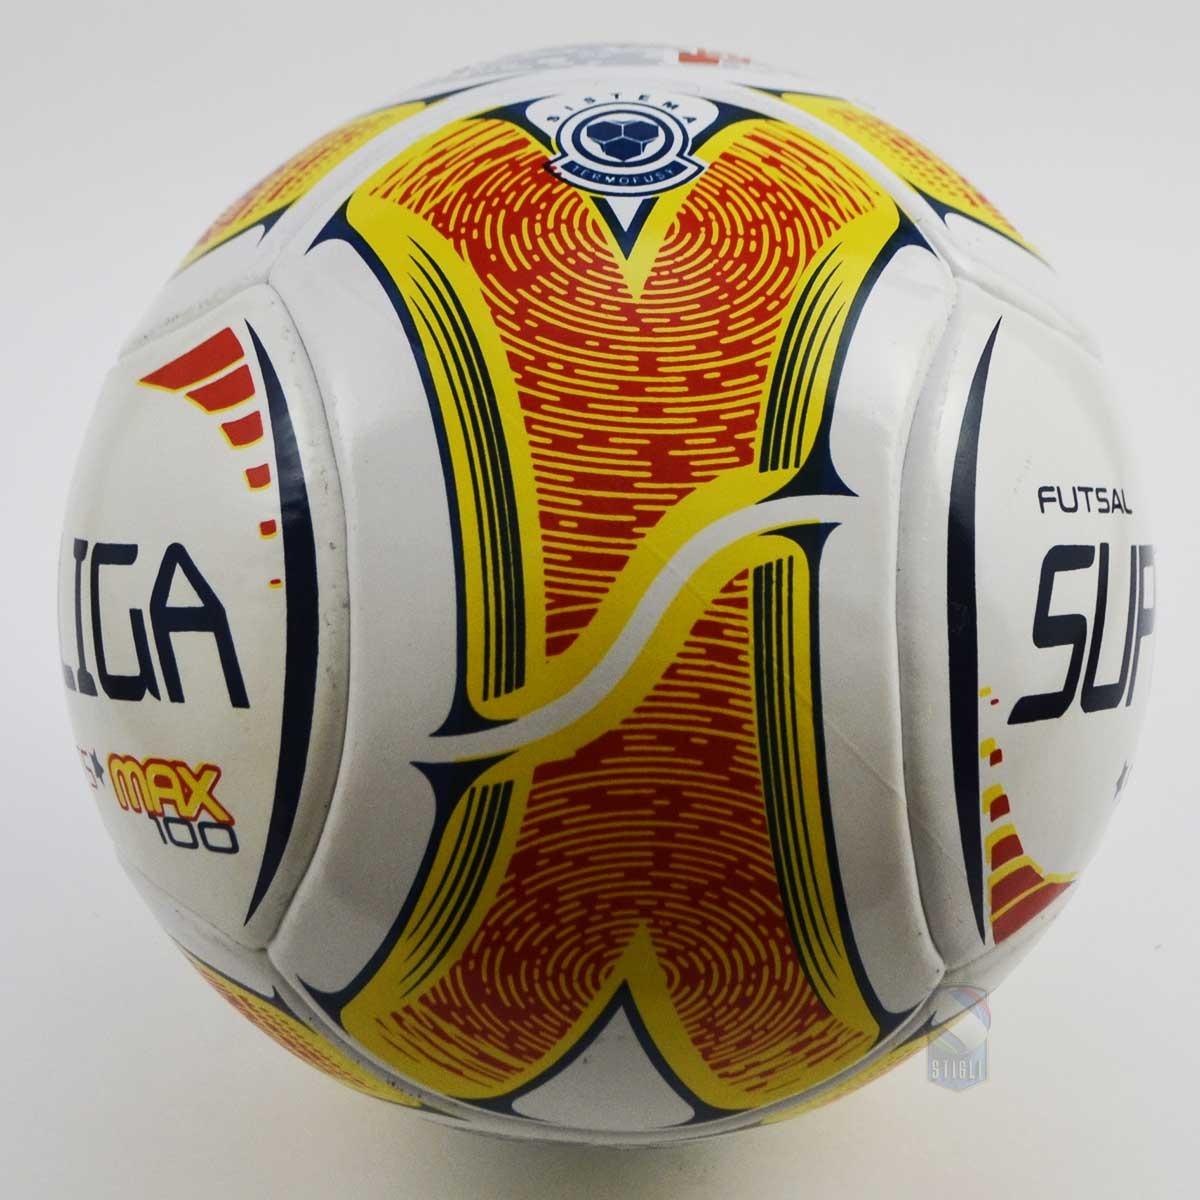 863f4b4e052e4 ... bolas termofusion infantil max 100 superliga futsal. Carregando zoom.